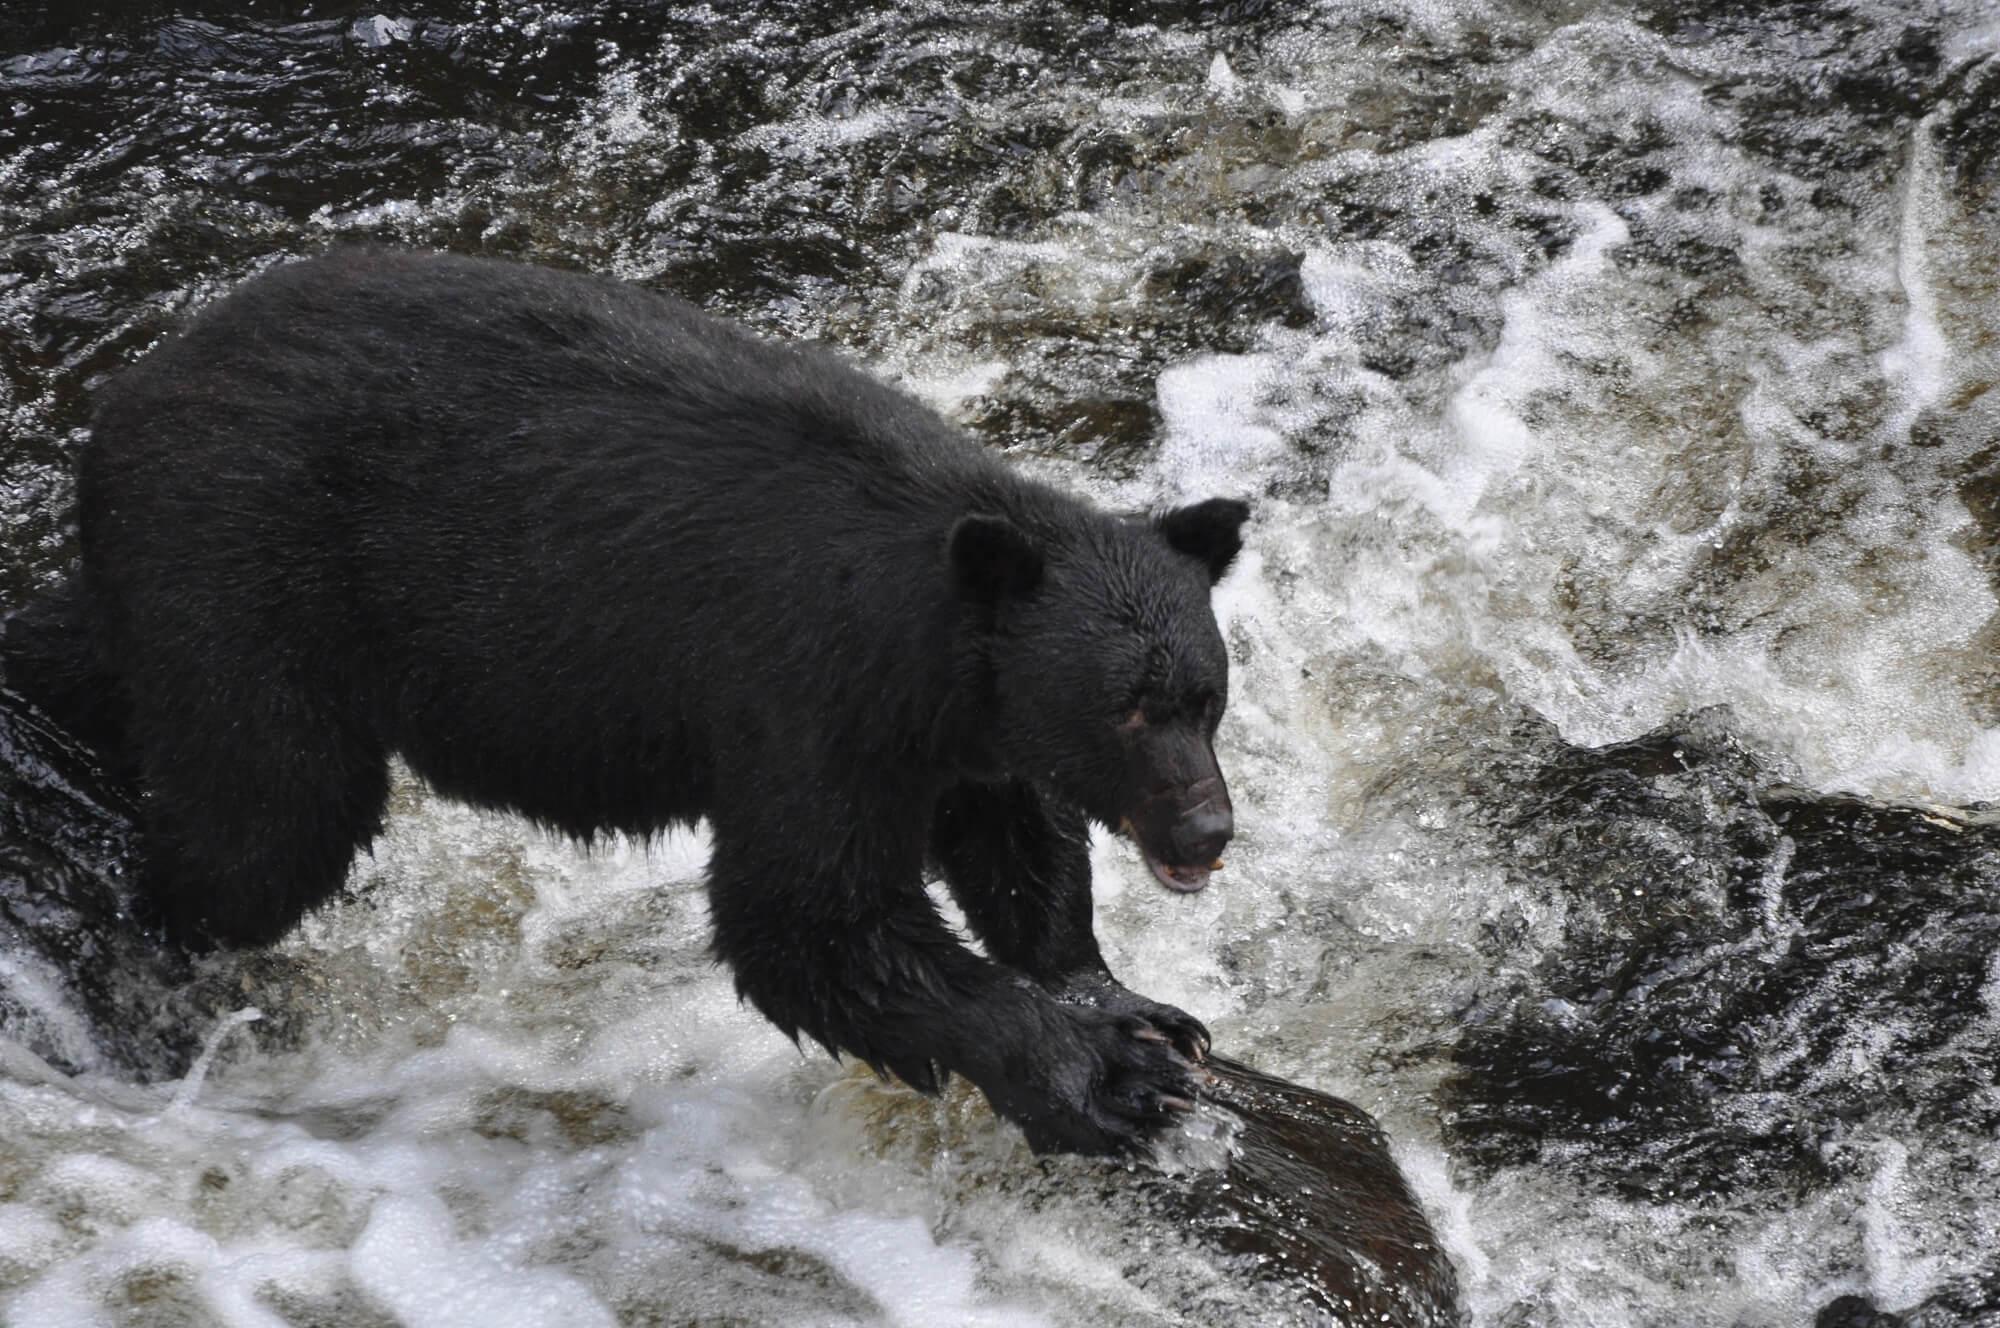 https://secureservercdn.net/72.167.241.180/c2p.415.myftpupload.com/wp-content/uploads/2018/10/Alaska-Bear-Black-Bear-on-rock-in-rapids.jpg?time=1634200883